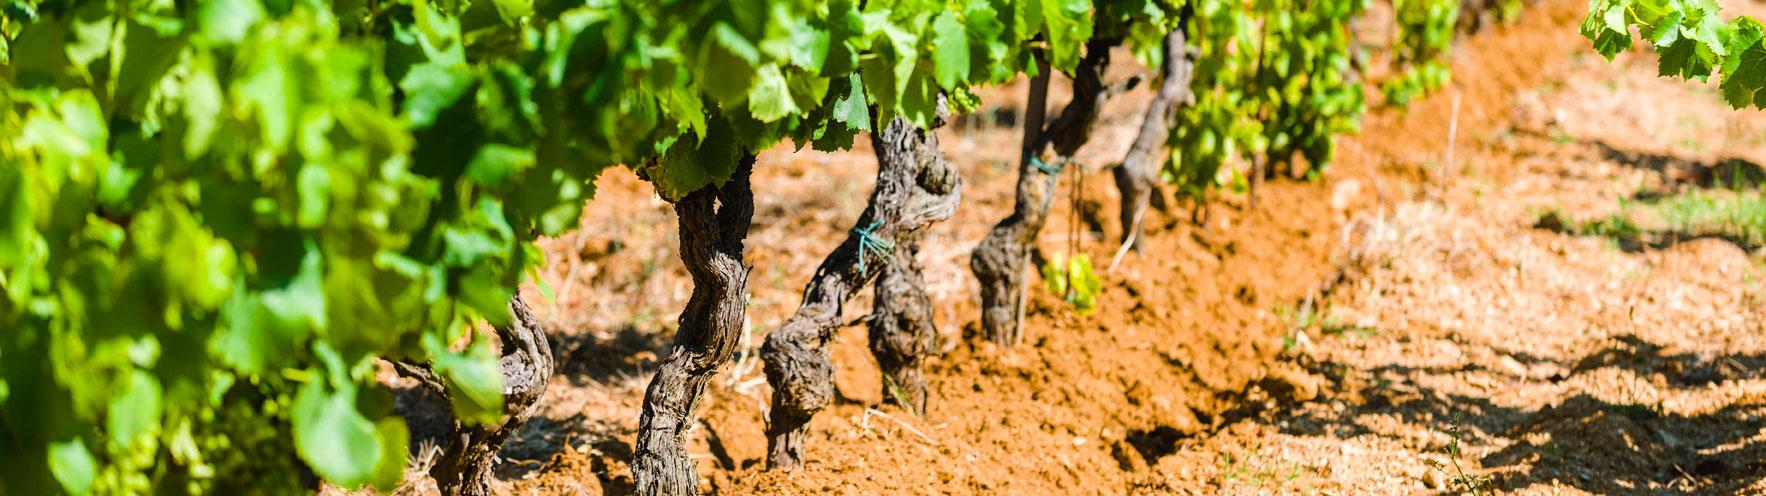 green rows of grape growing on soil in barbeyrolles vineyard in France